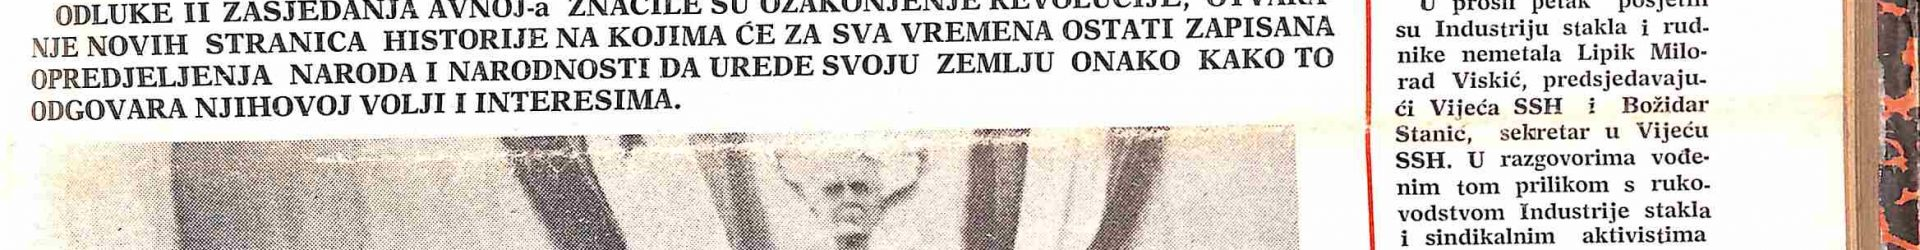 28. studeni 1980